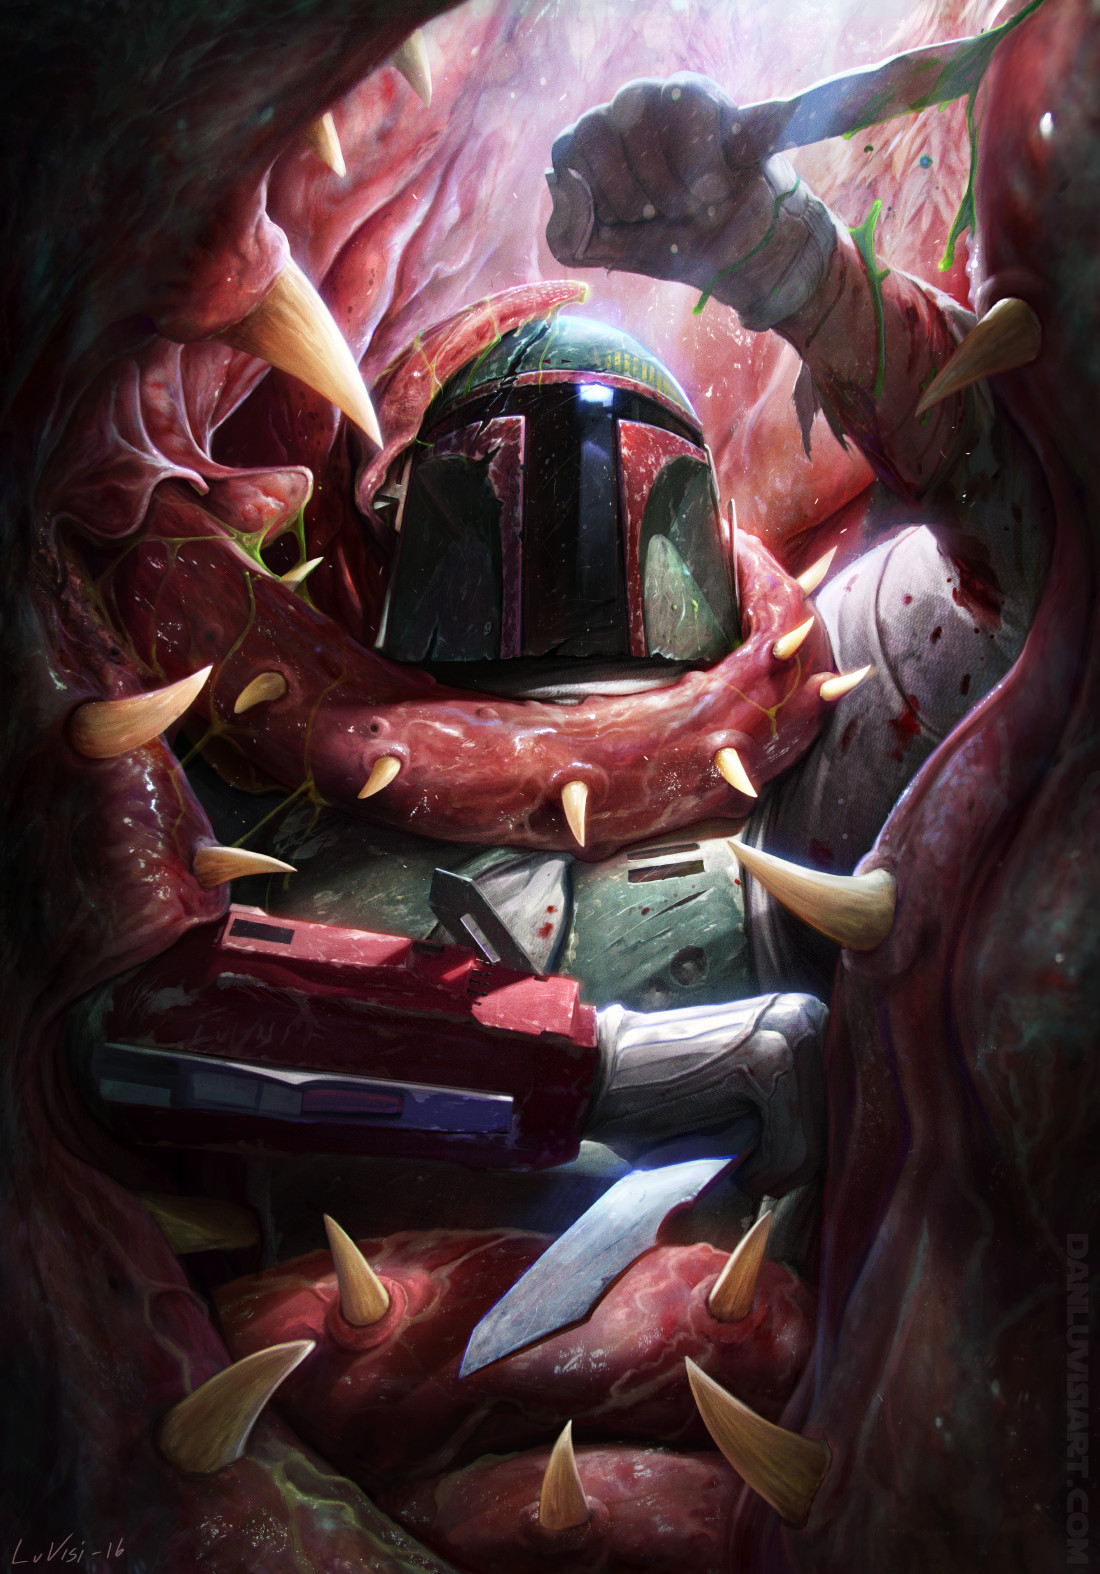 Star Wars Artwork Science Fiction Bounty Hunter Sarlacc Star Wars Villains Villains Creature Dan Luv 1100x1574